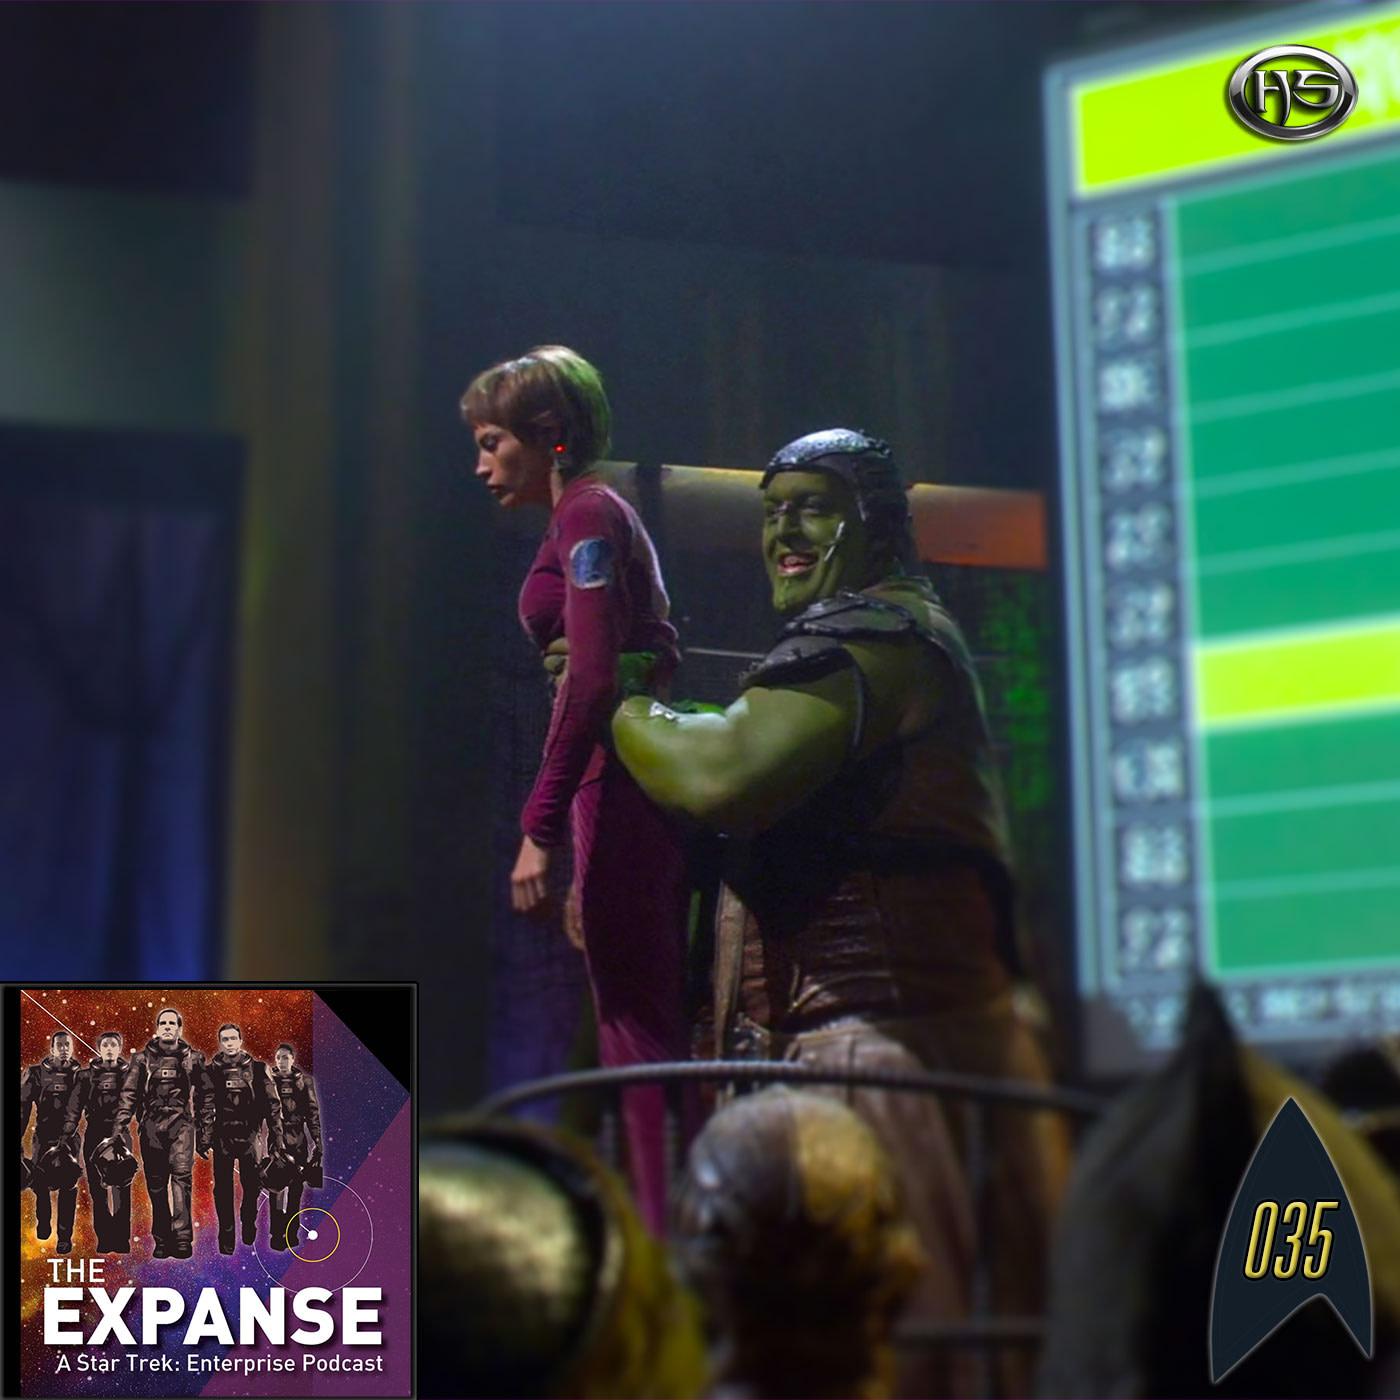 The Expanse Episode 35